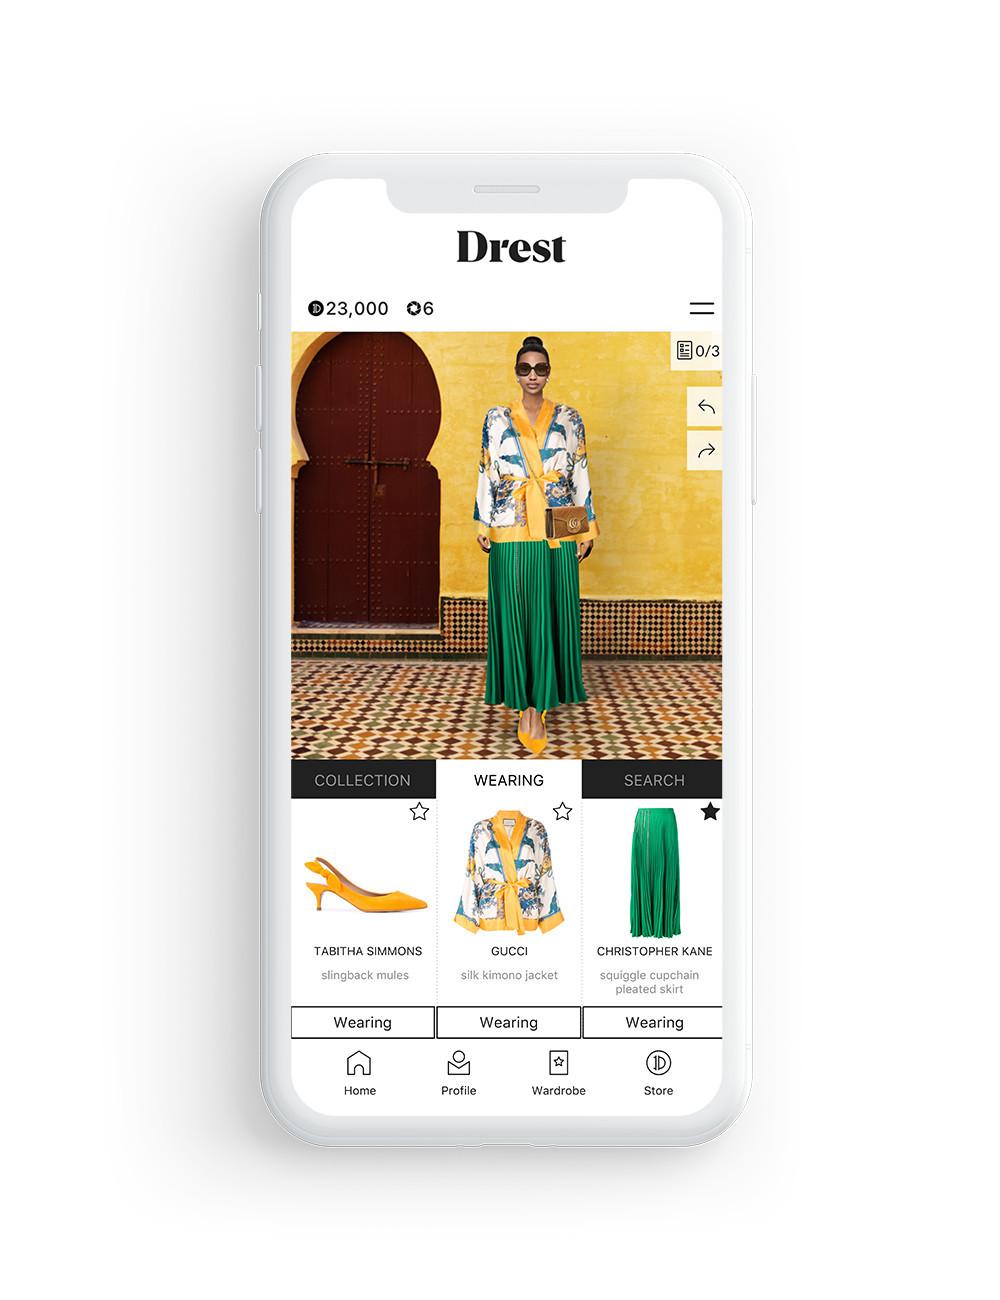 Gucci-Drest-App